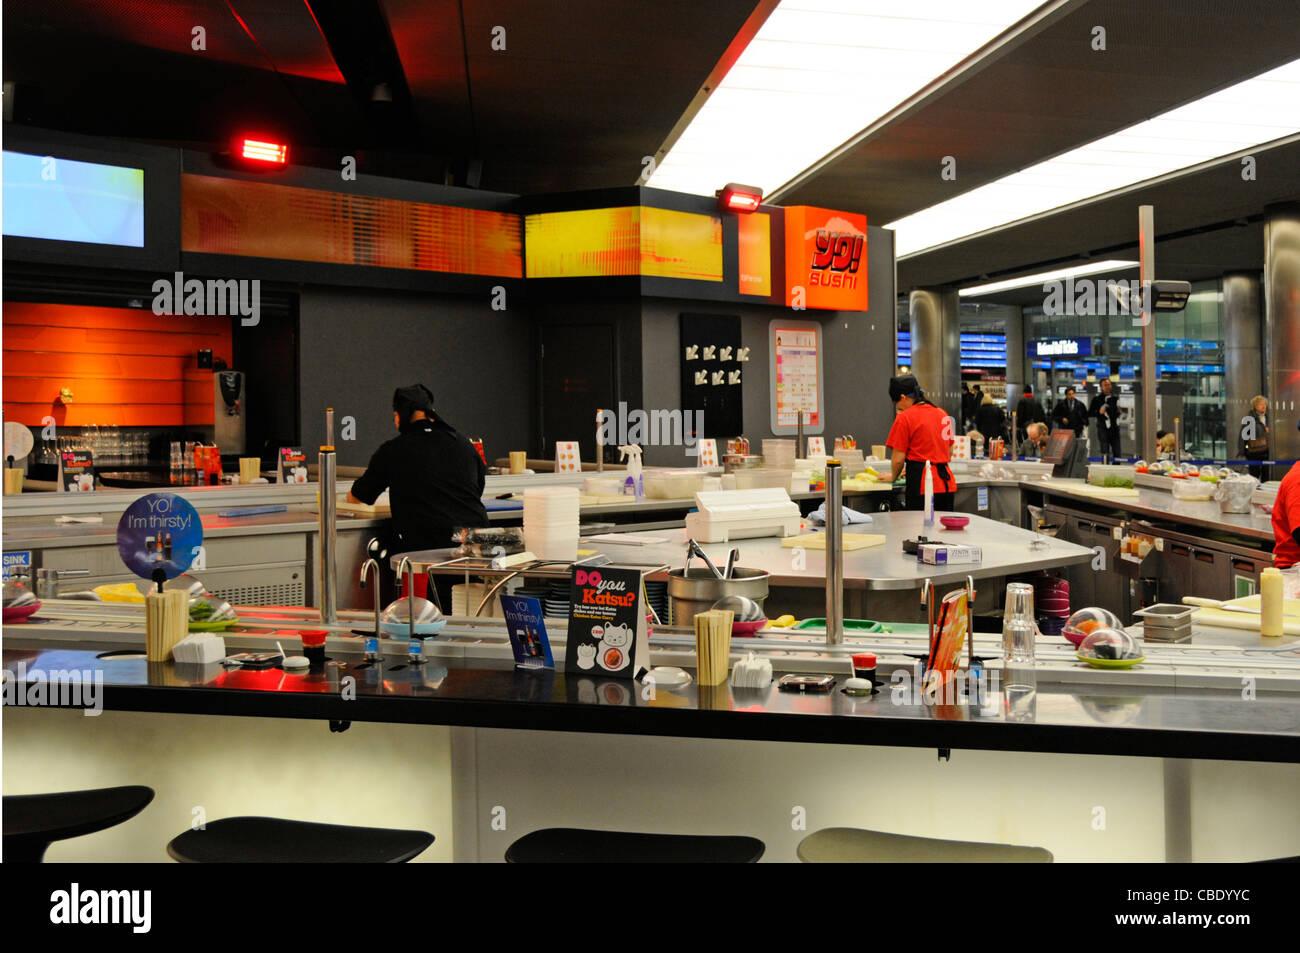 YO! Sushi conveyor belt yo sushi food restaurant at St Pancras train station London England UK - Stock Image